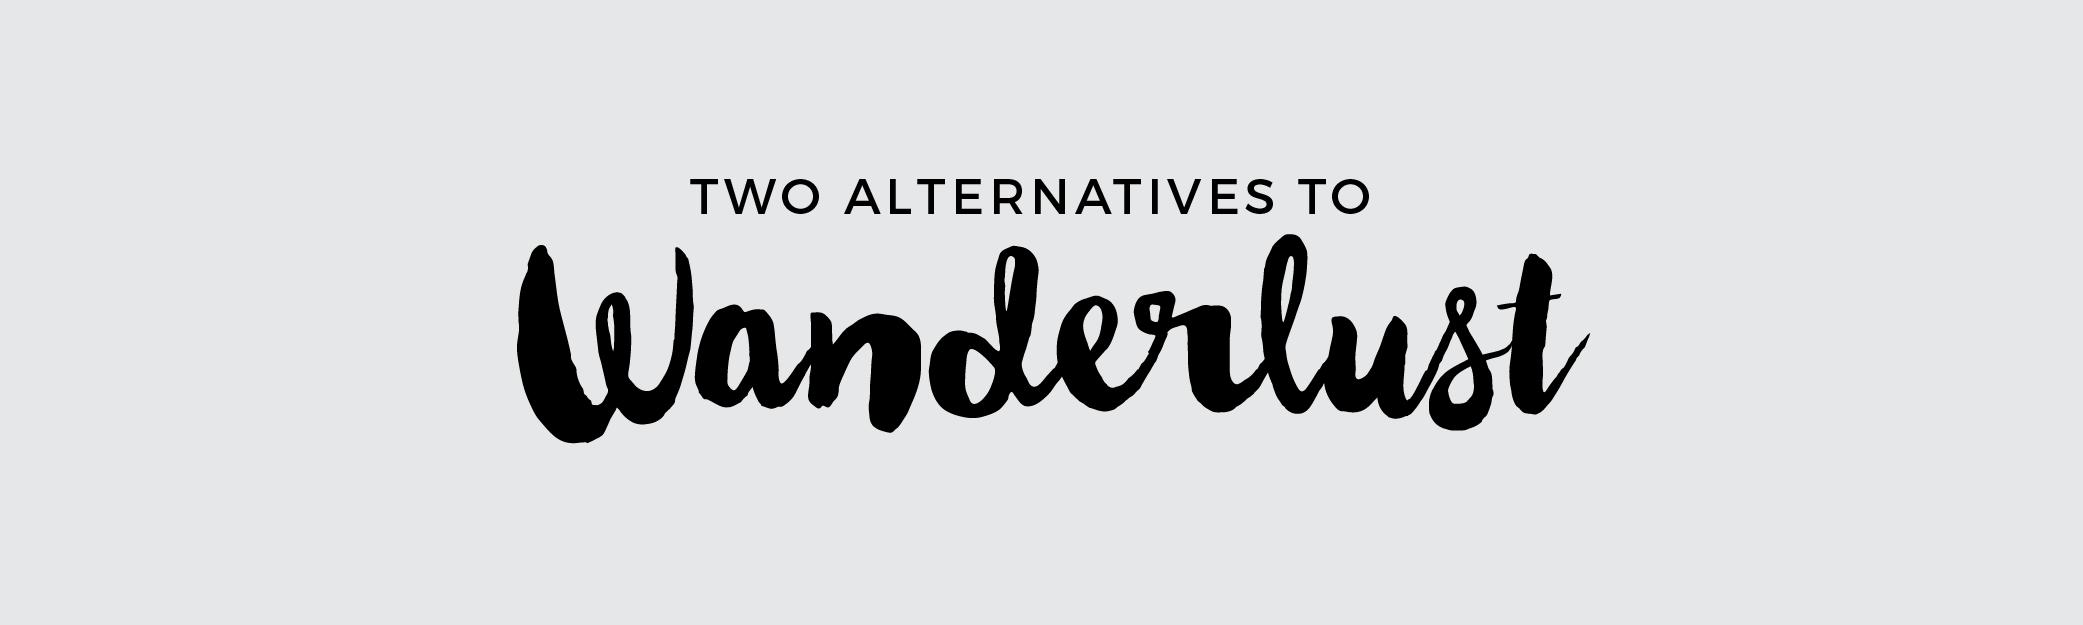 wanderlust alternatives-01.png